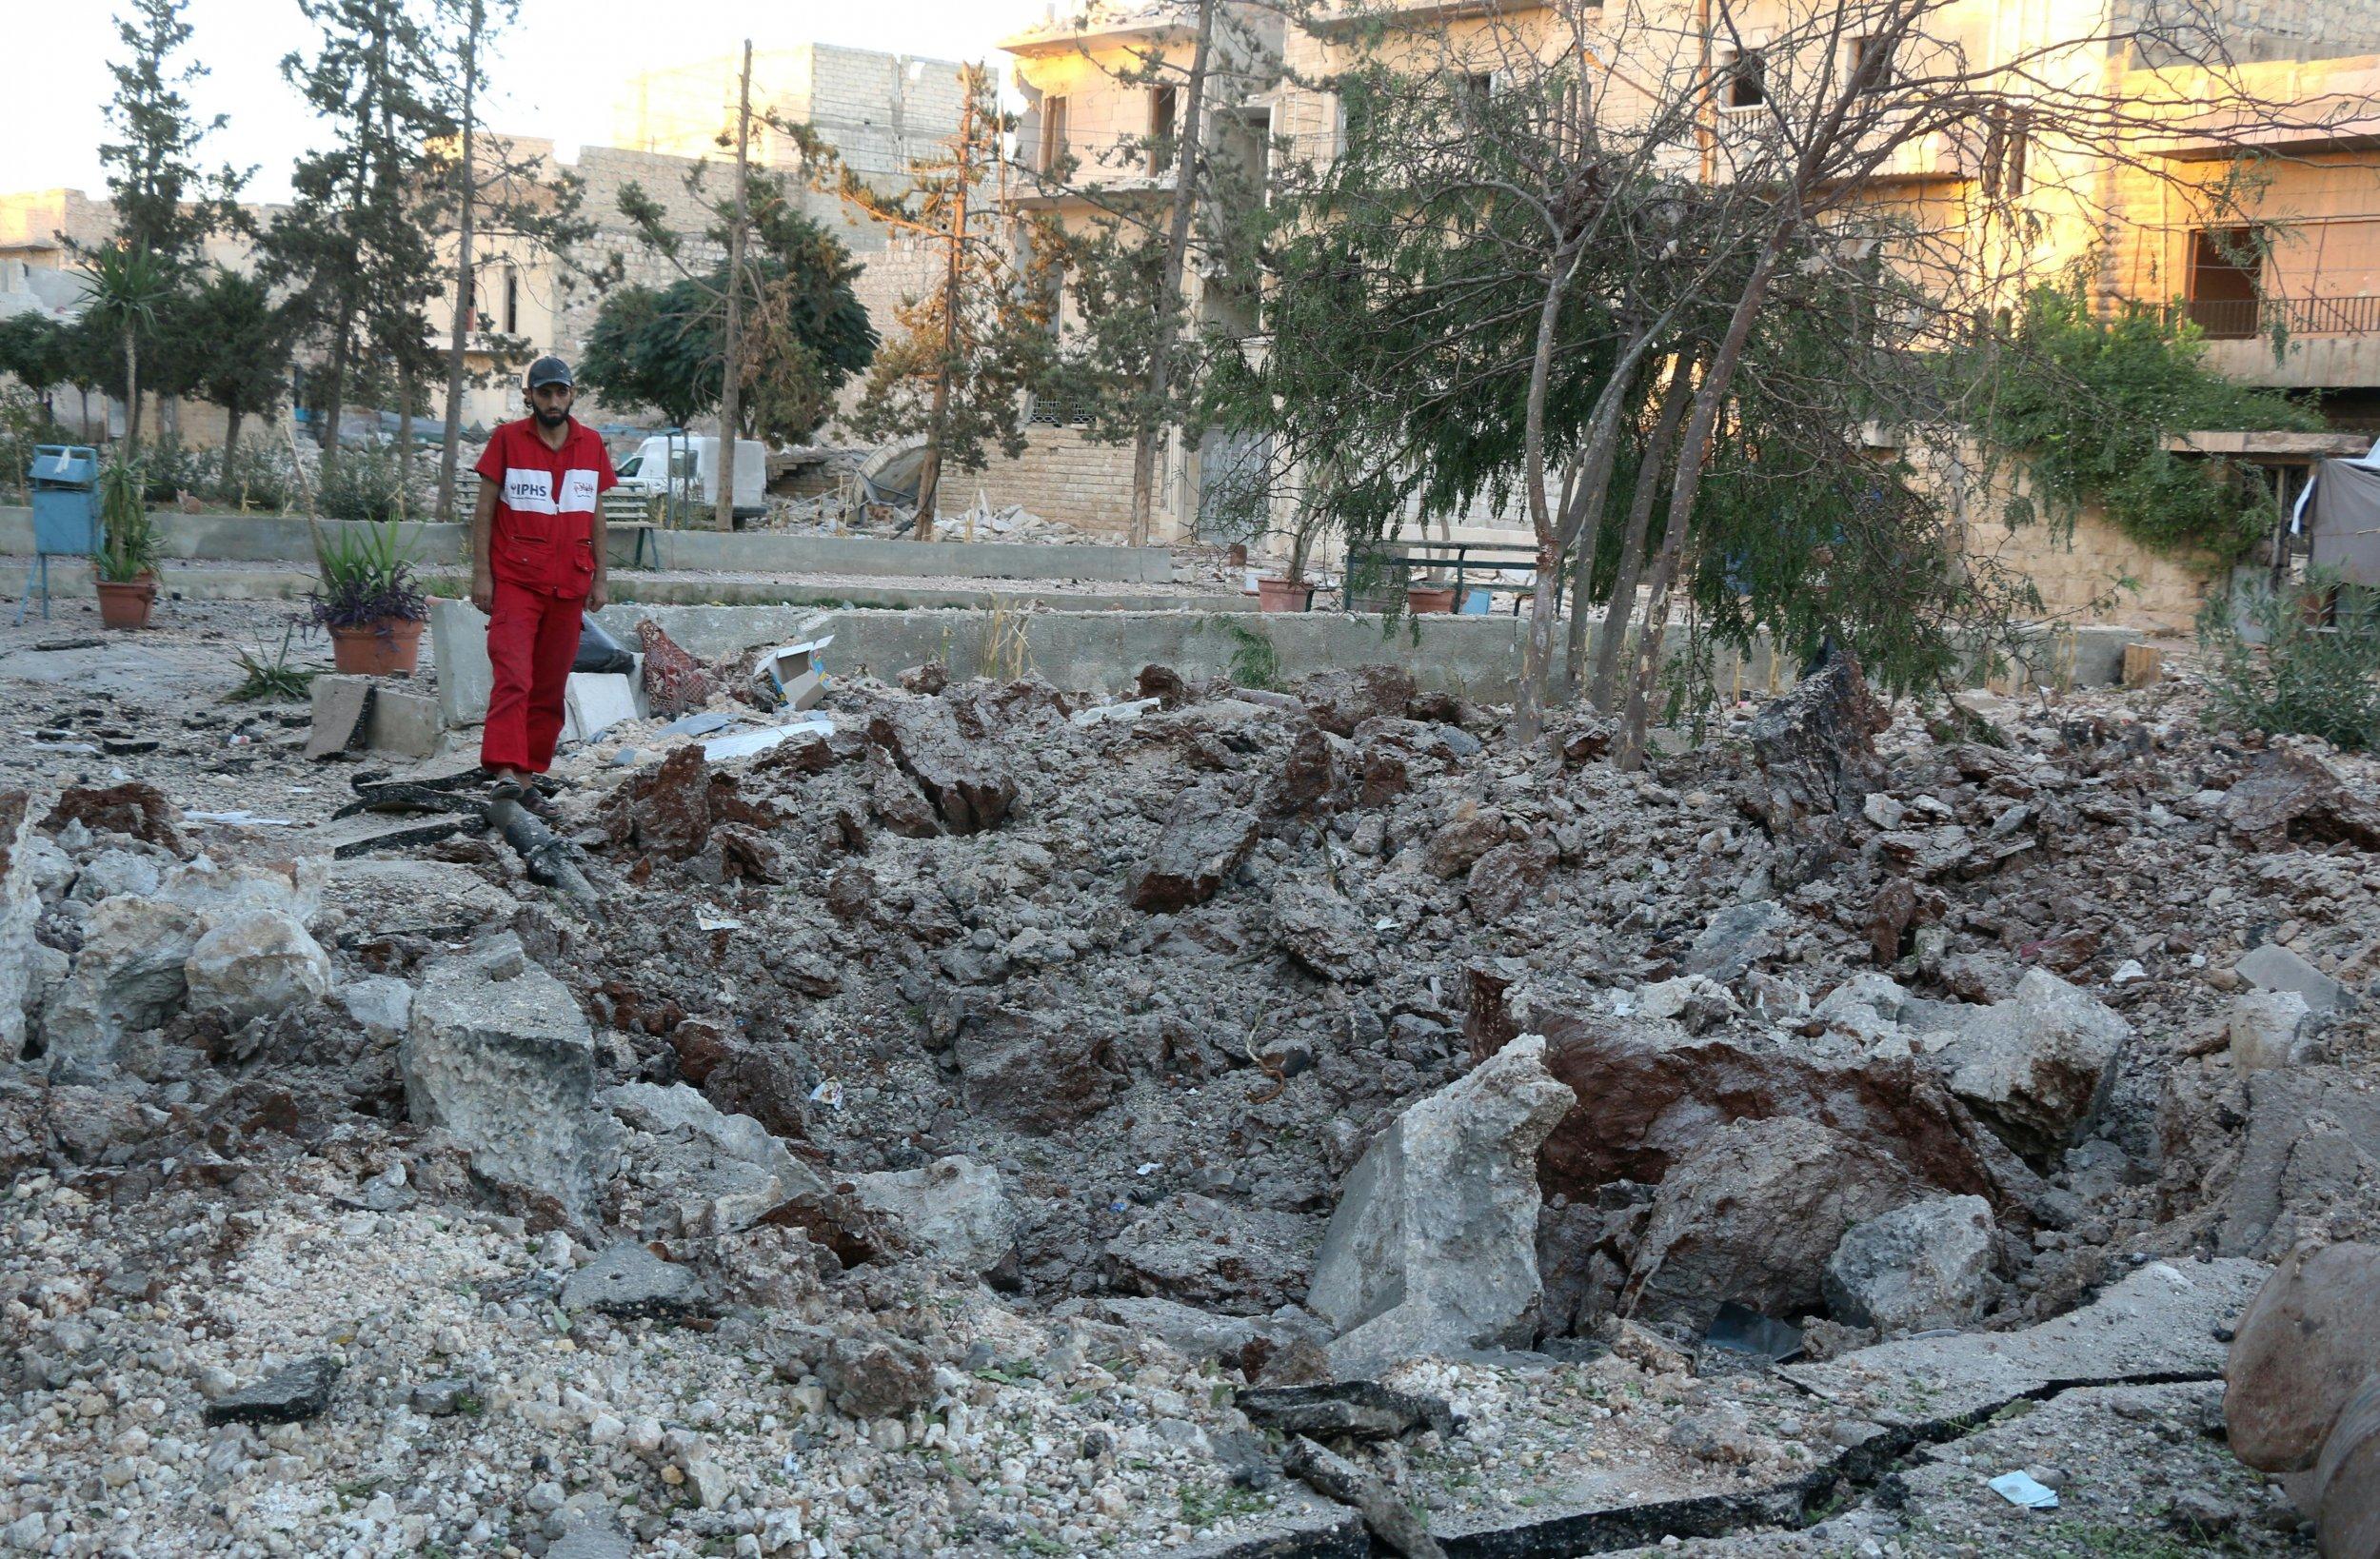 Aleppo medical facility